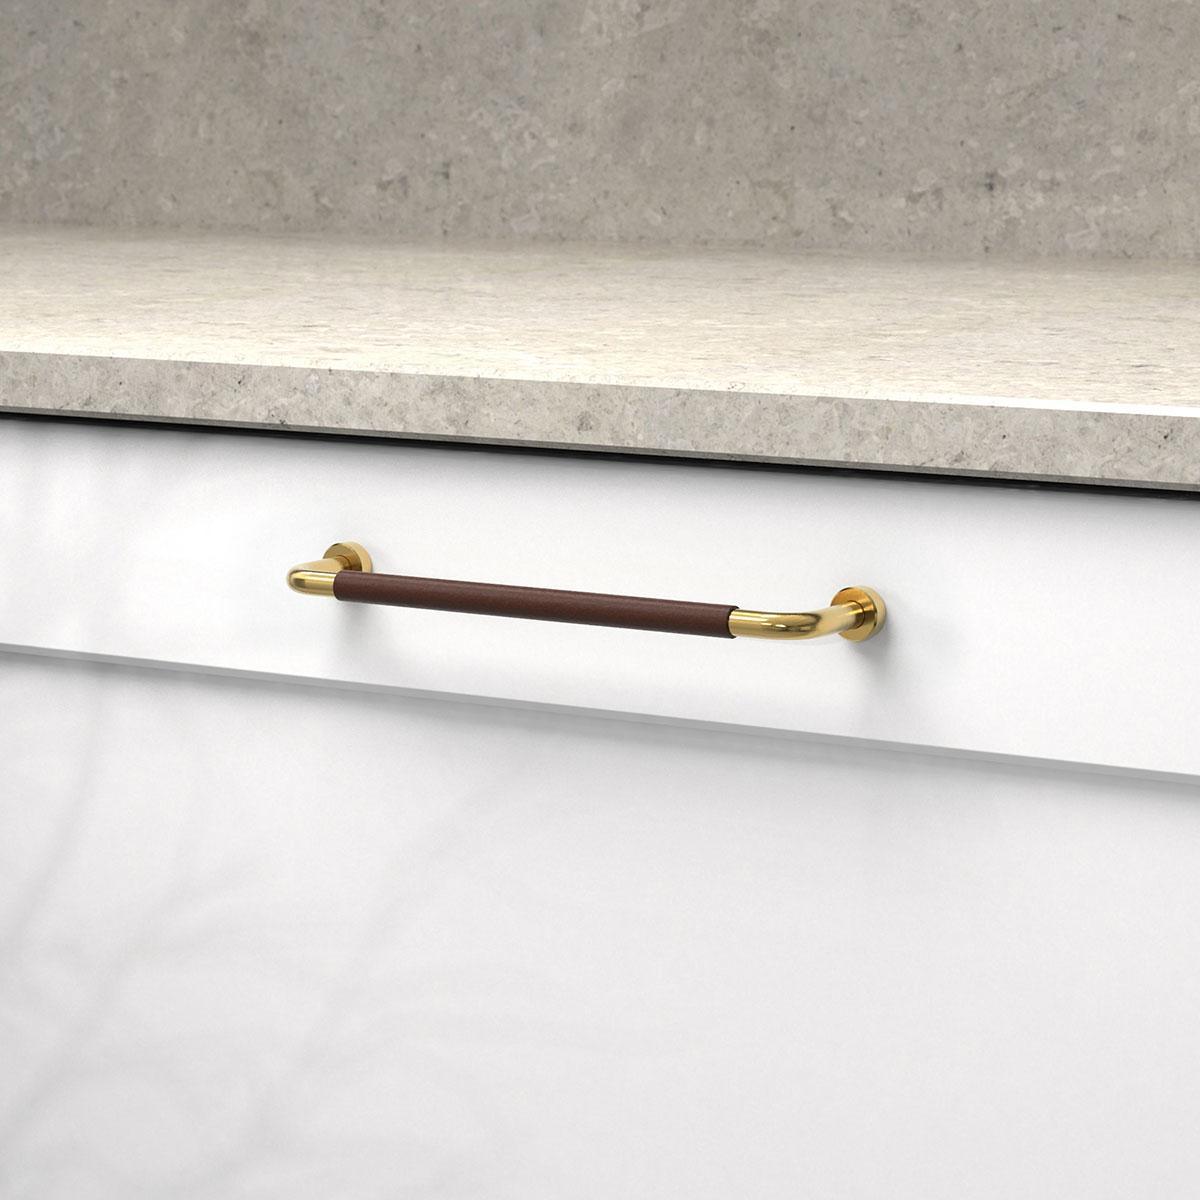 Handtag lounge polerad massing ladersvept brun 370103 11 cc 160 mm ncs s 0300 n kalksten